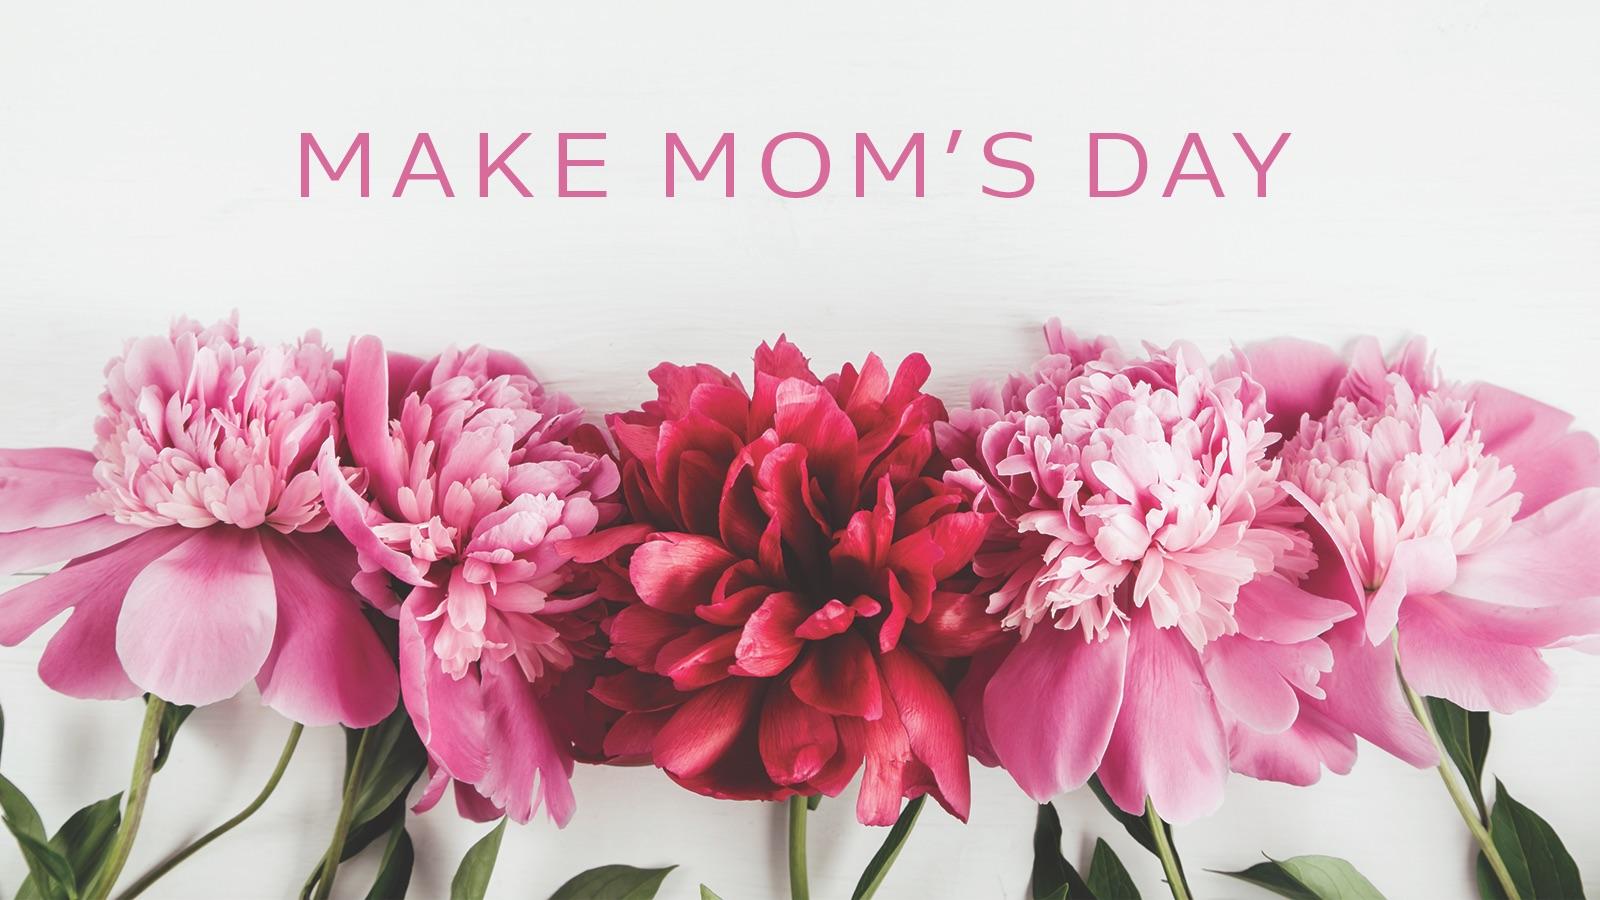 MothersDay-2.jpg